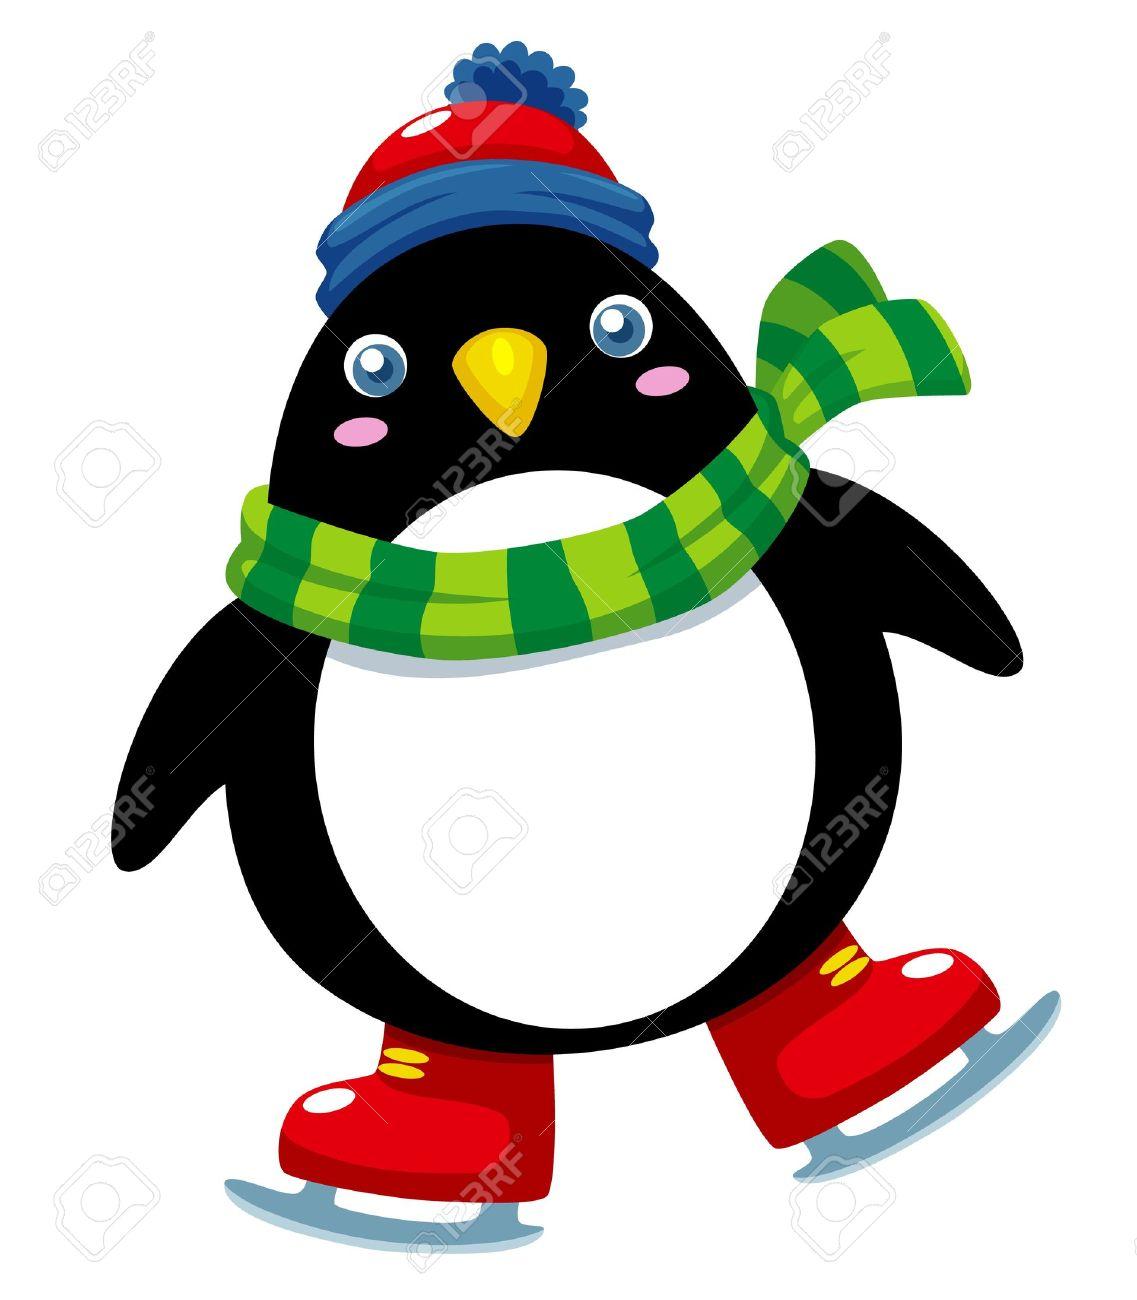 Illustration of cute penguin ice skates Stock Vector - 15904570